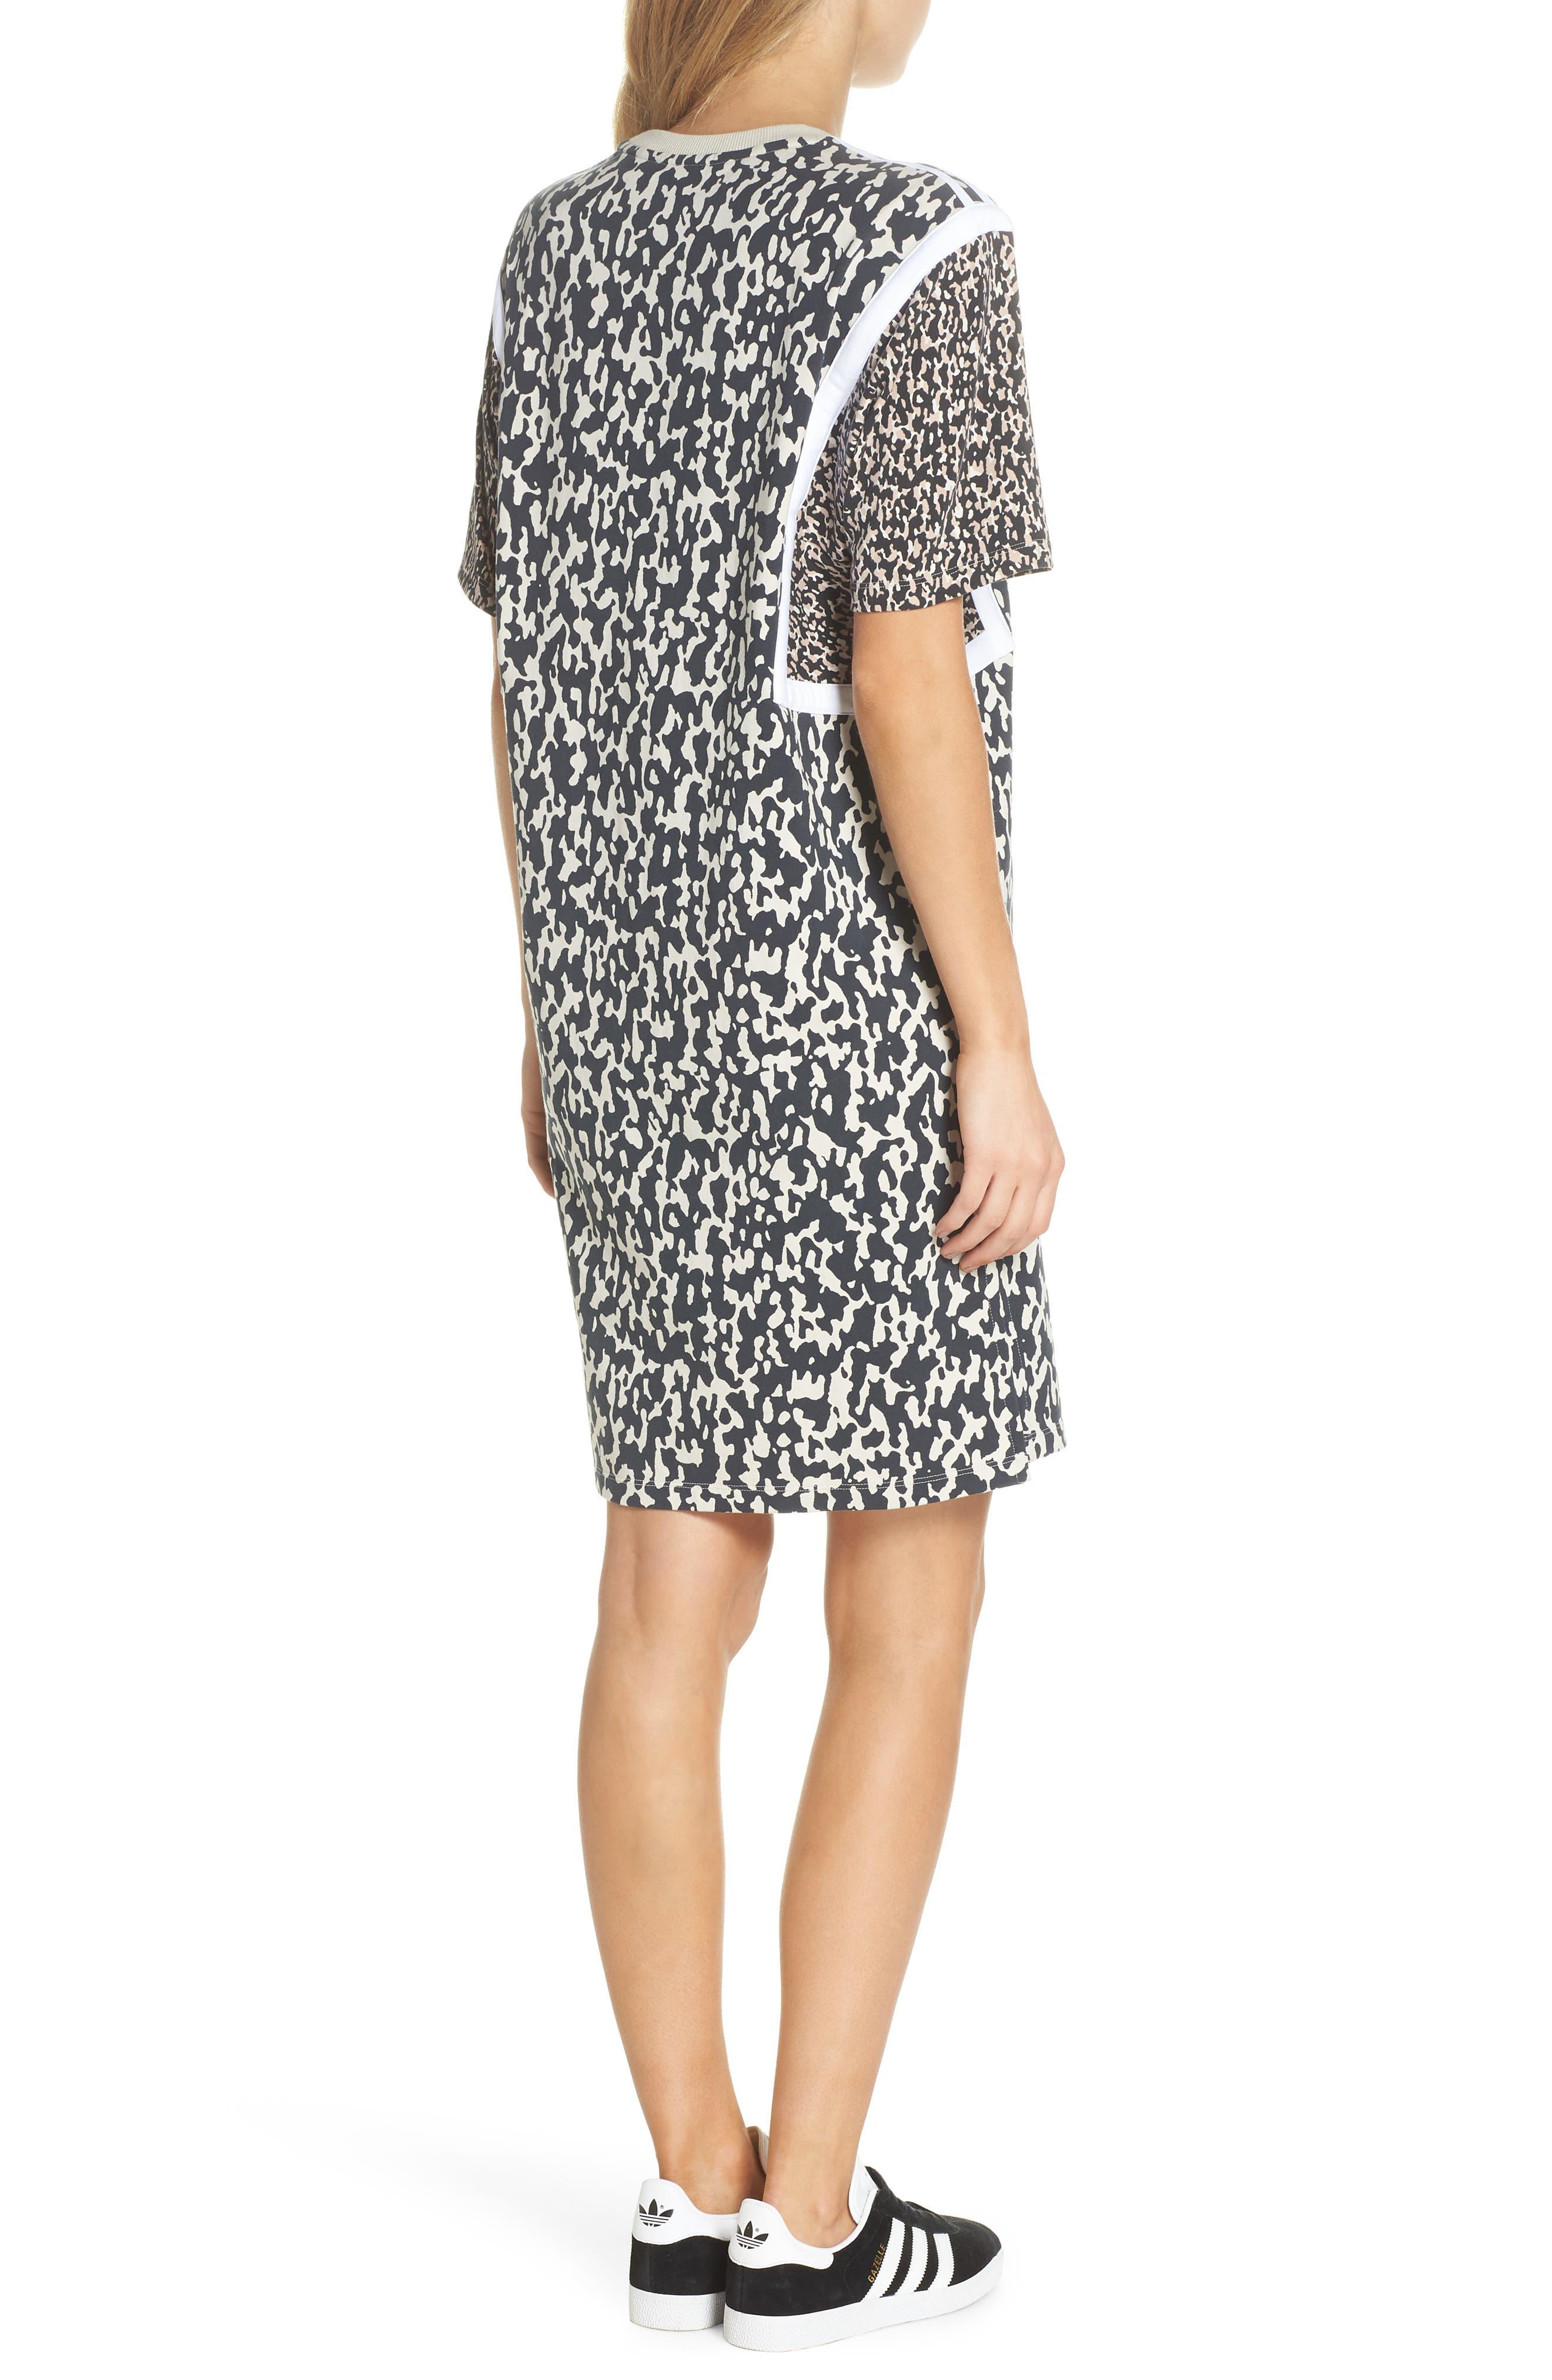 adidas Animal Print Shift Dress,                             Alternate thumbnail 2, color,                             250